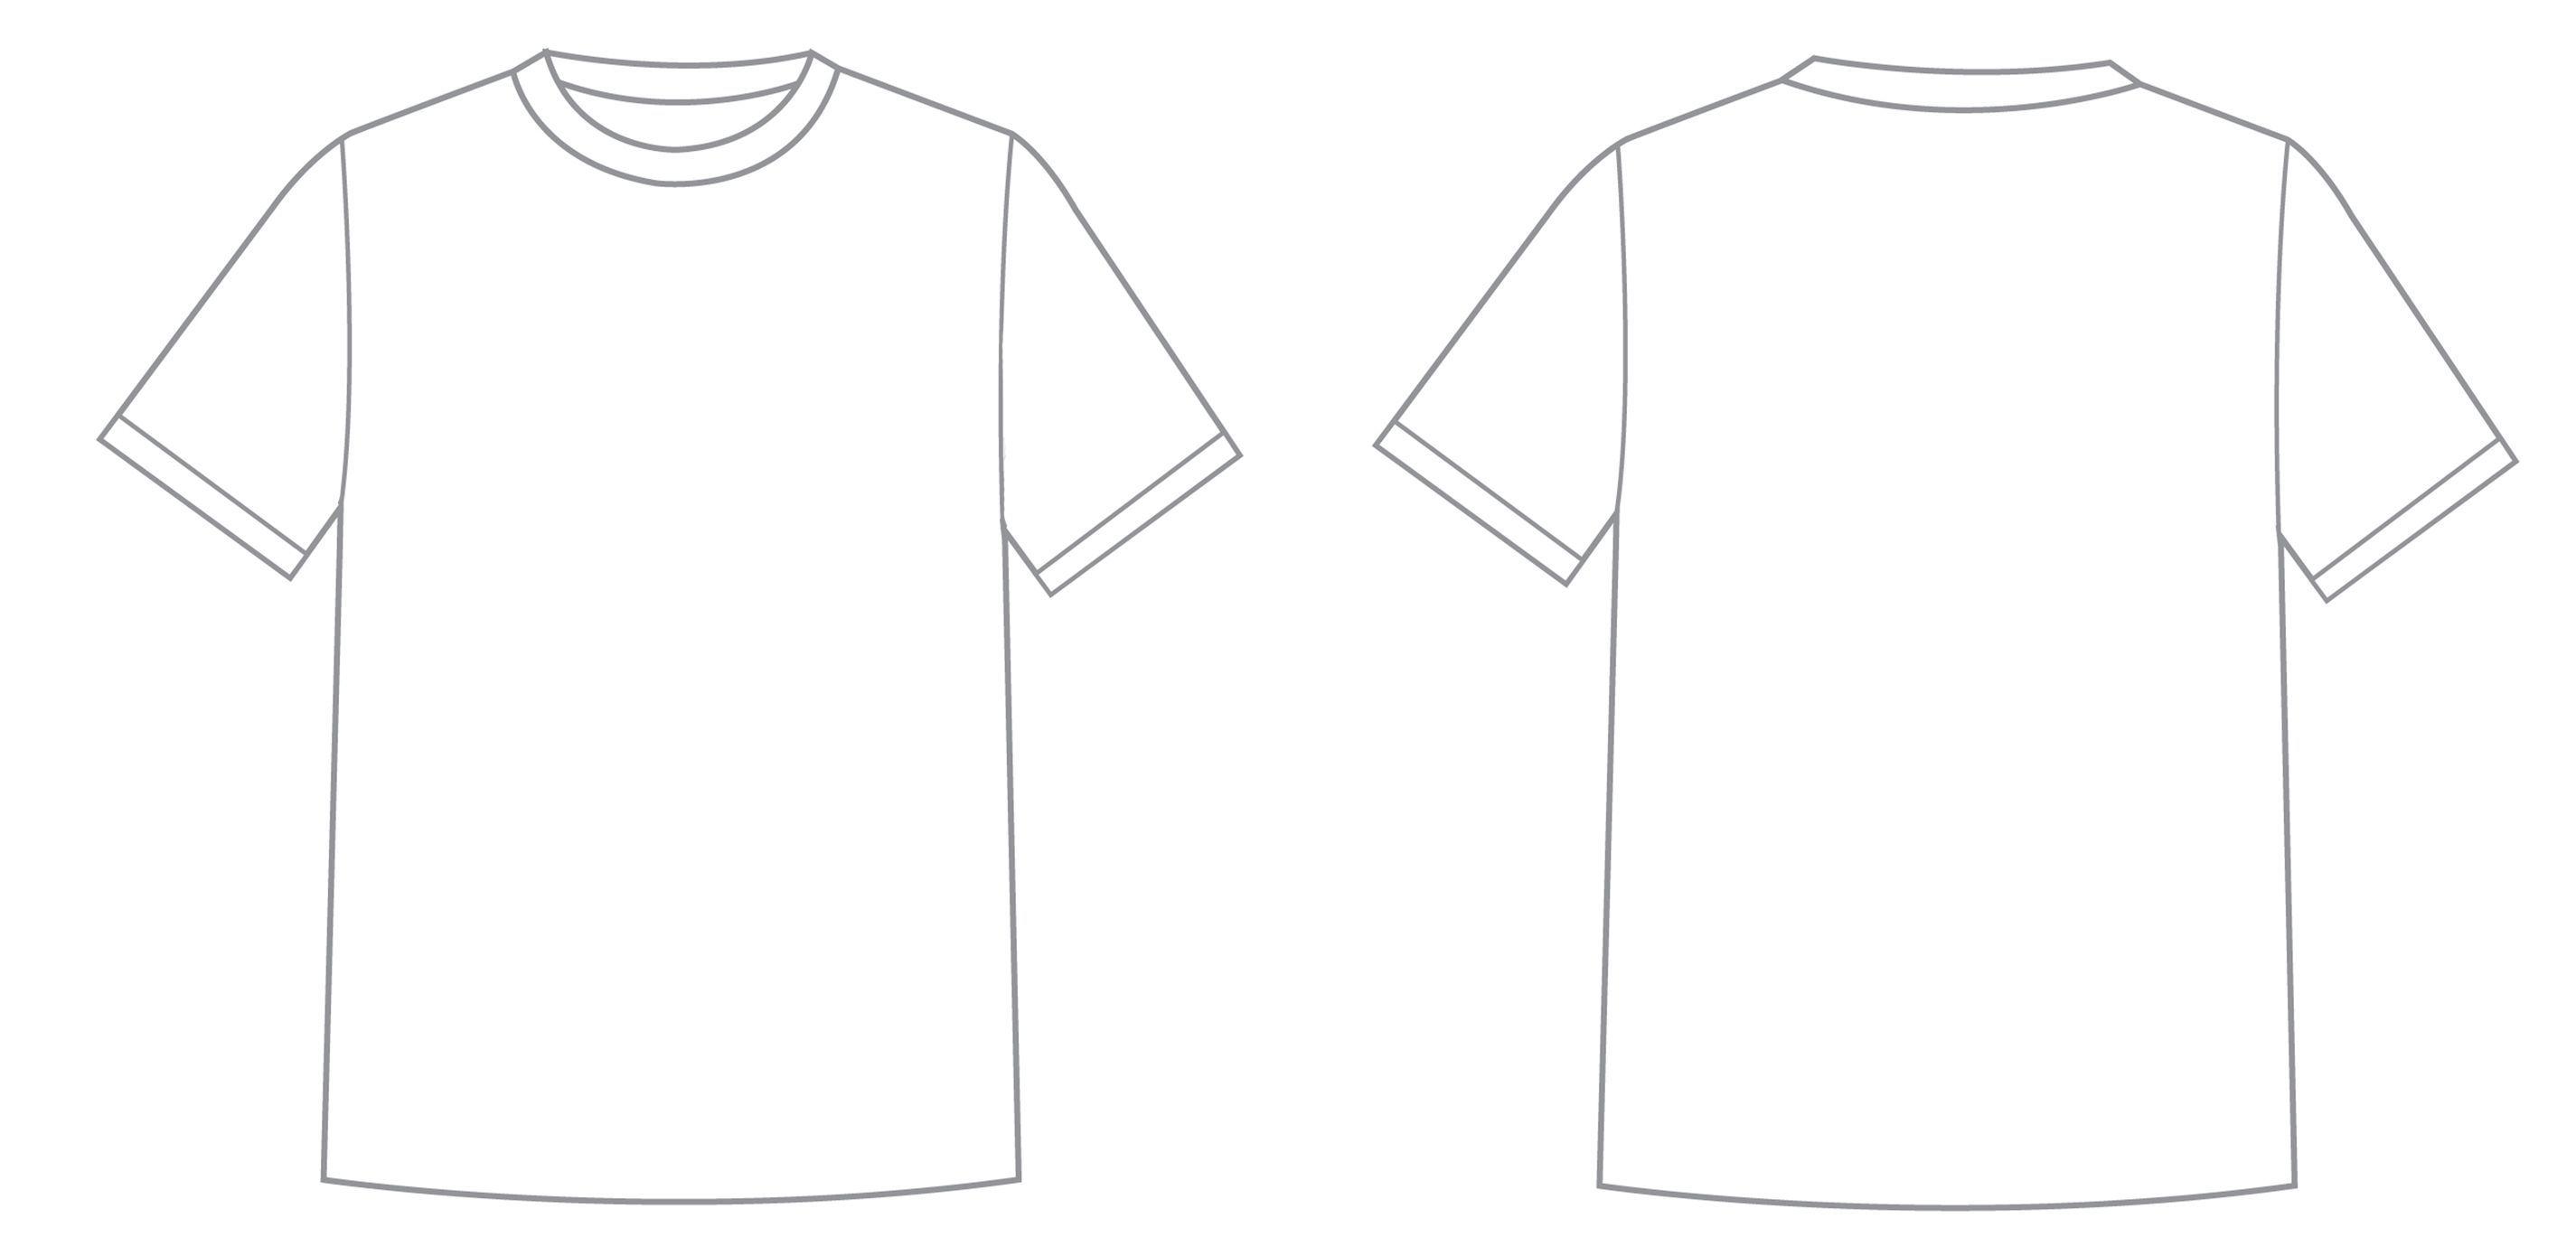 003 Impressive T Shirt Template Design Photo  Psd Free Download EditableFull